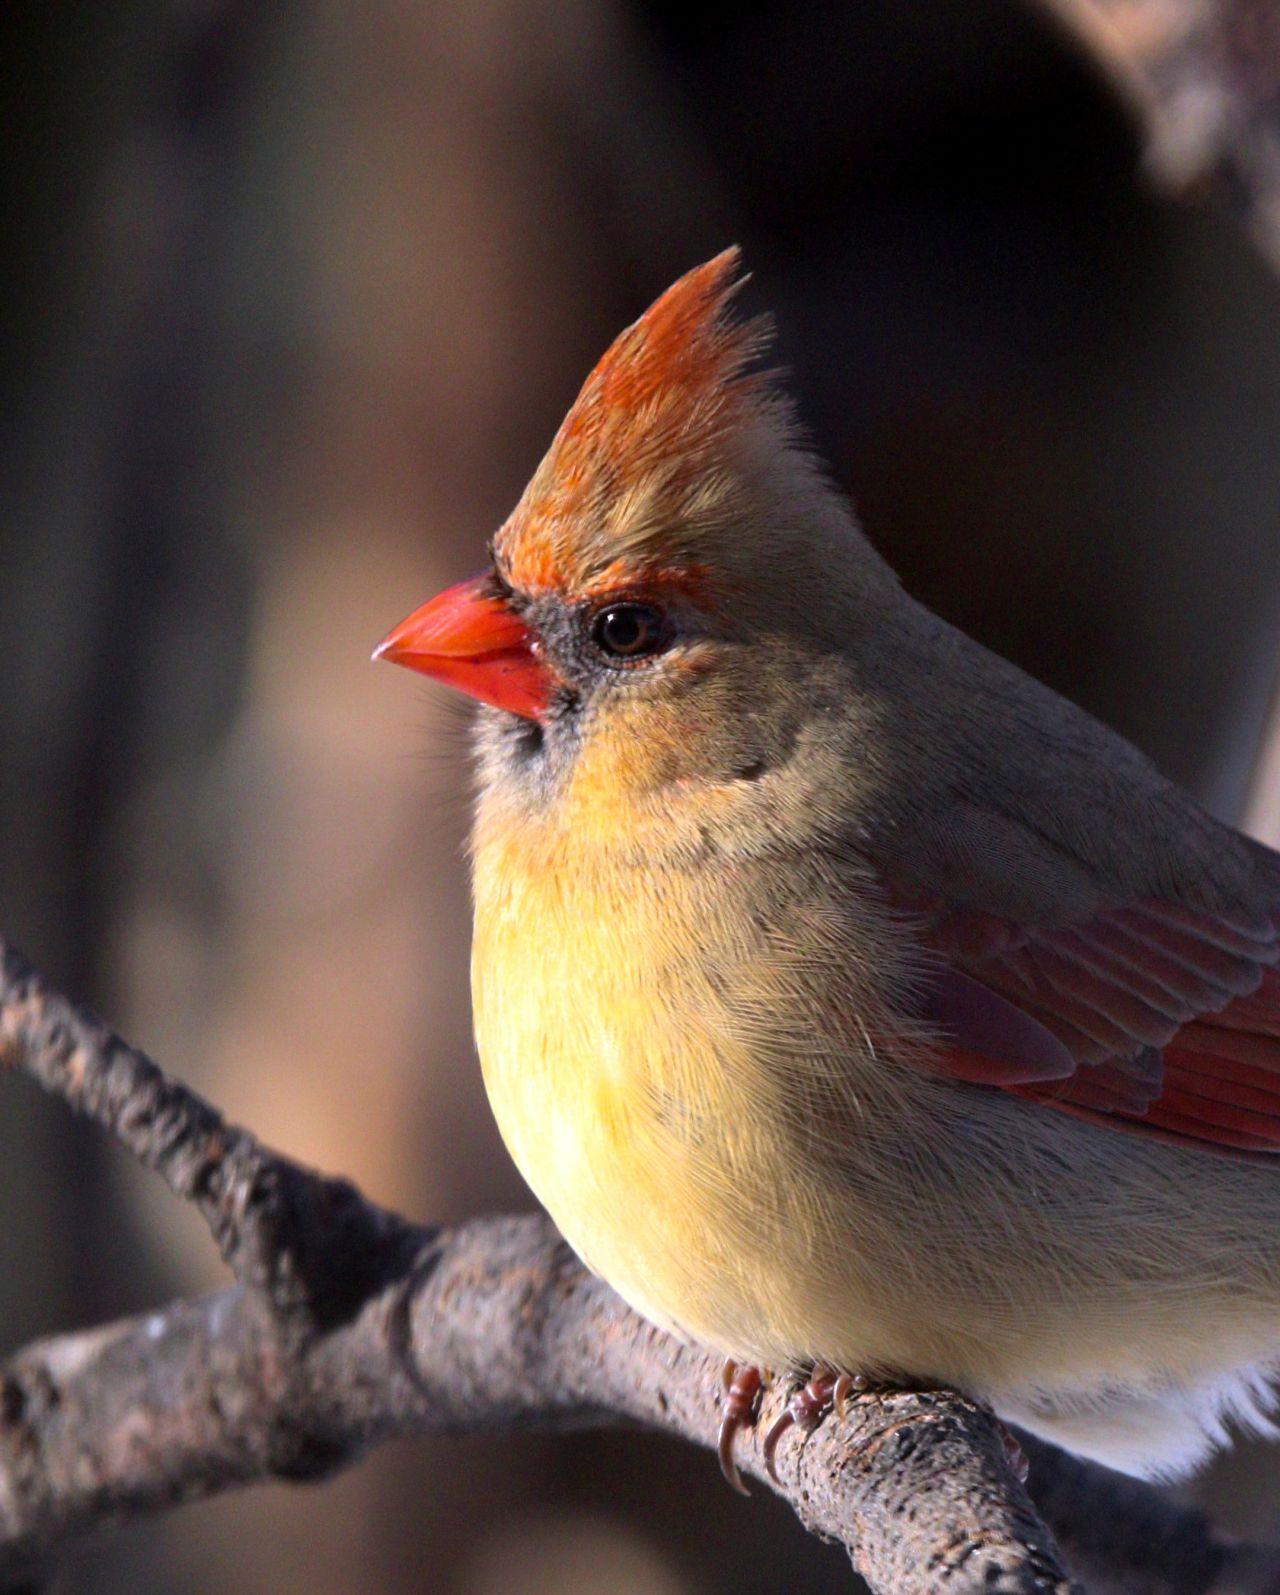 Female cardinal enjoys some sun (photo)